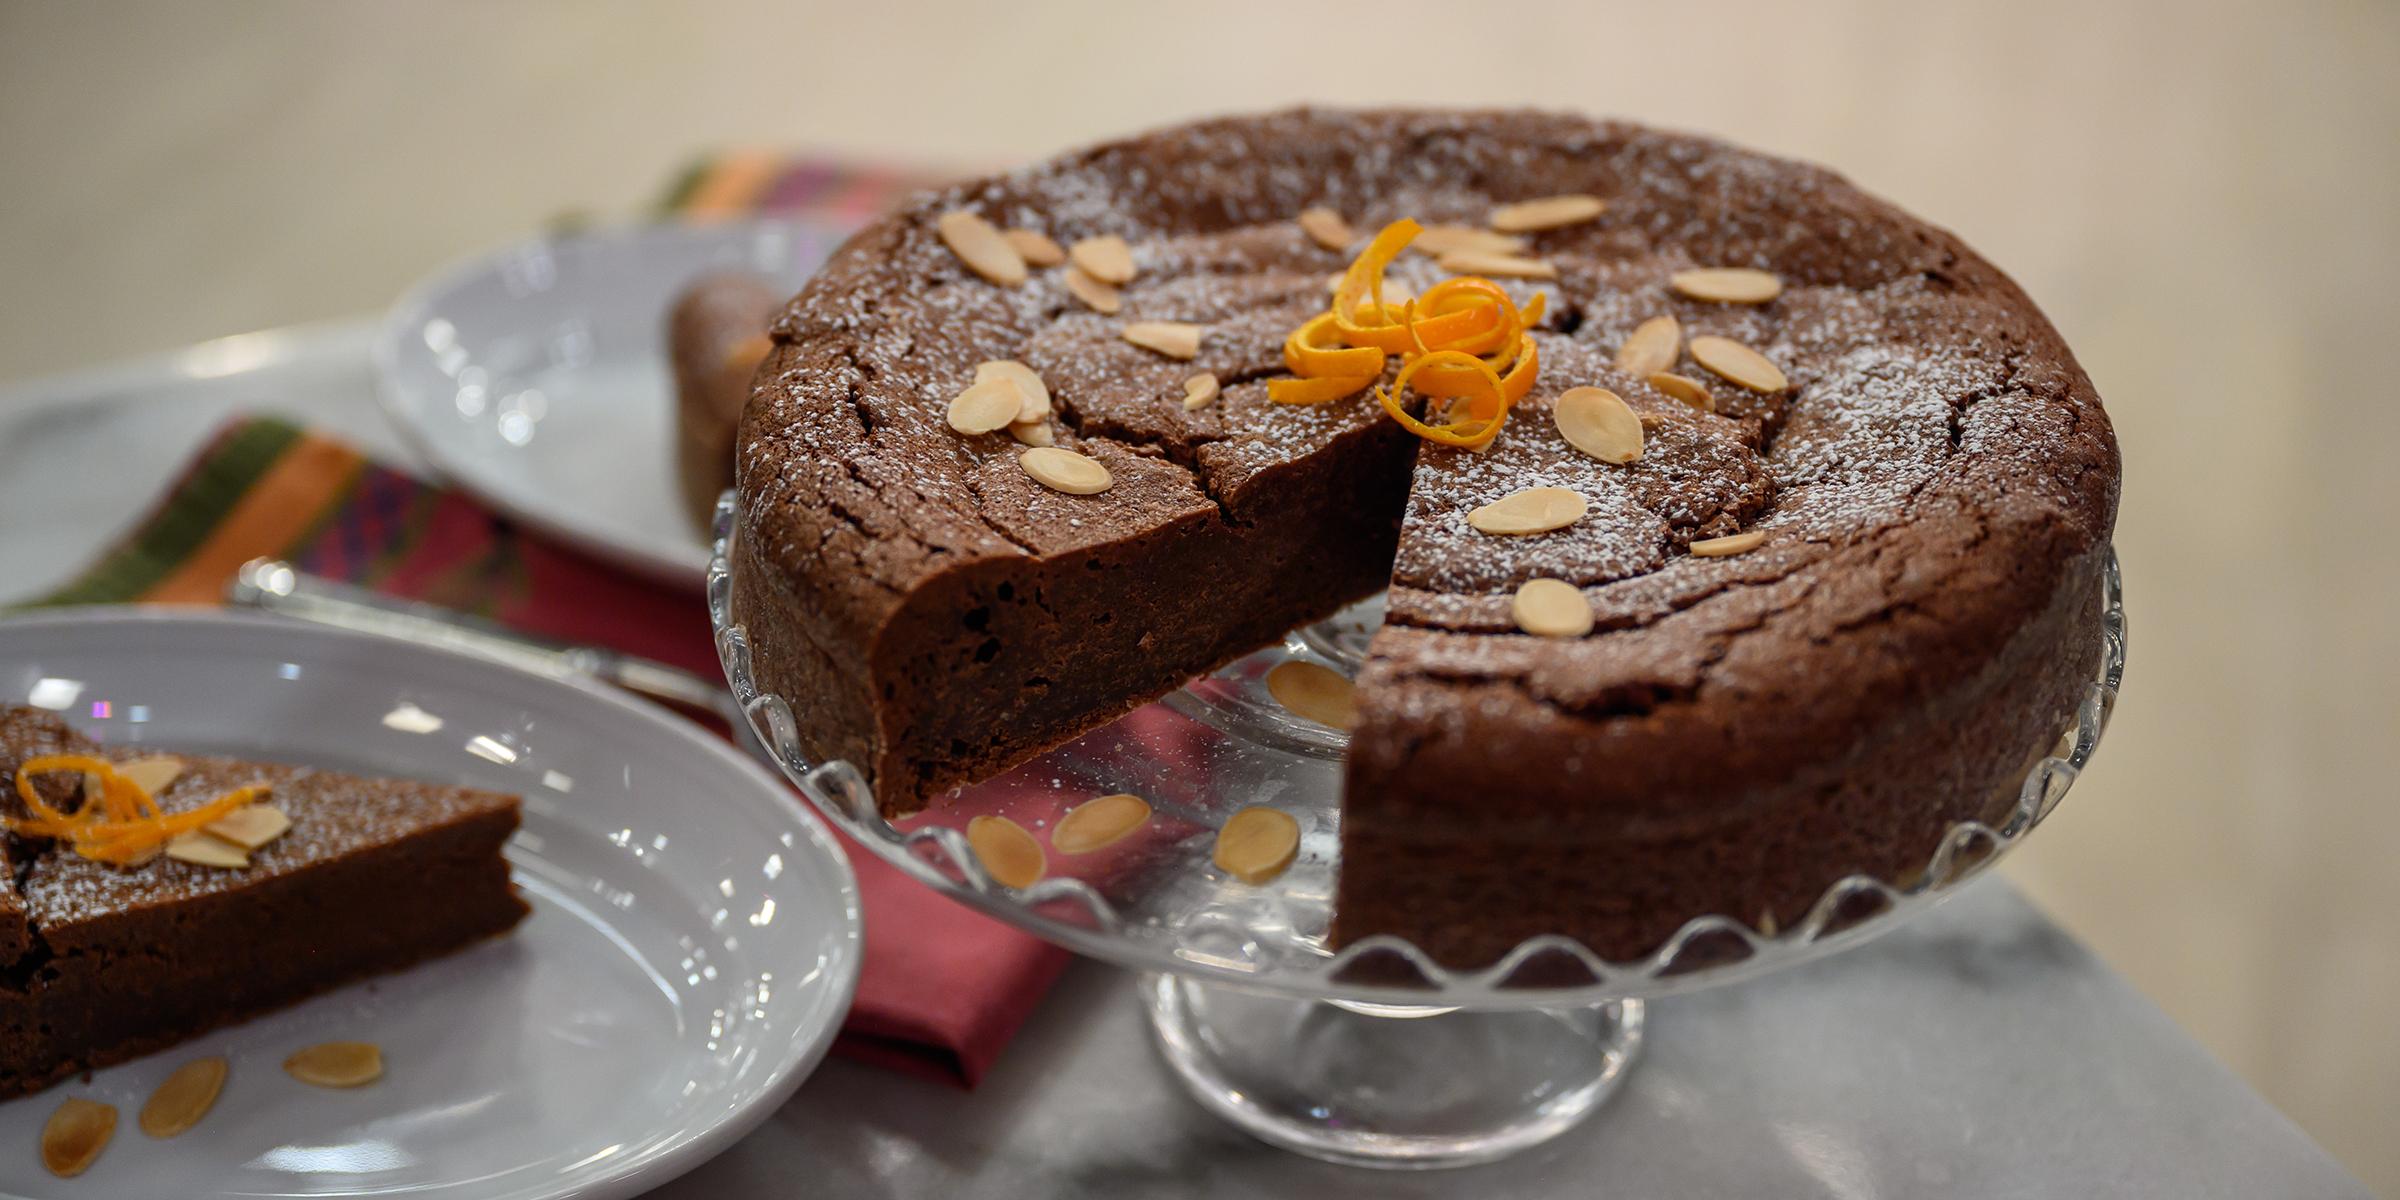 Bake Lidia Bastianich's chocolate-almond tart for any festive gathering